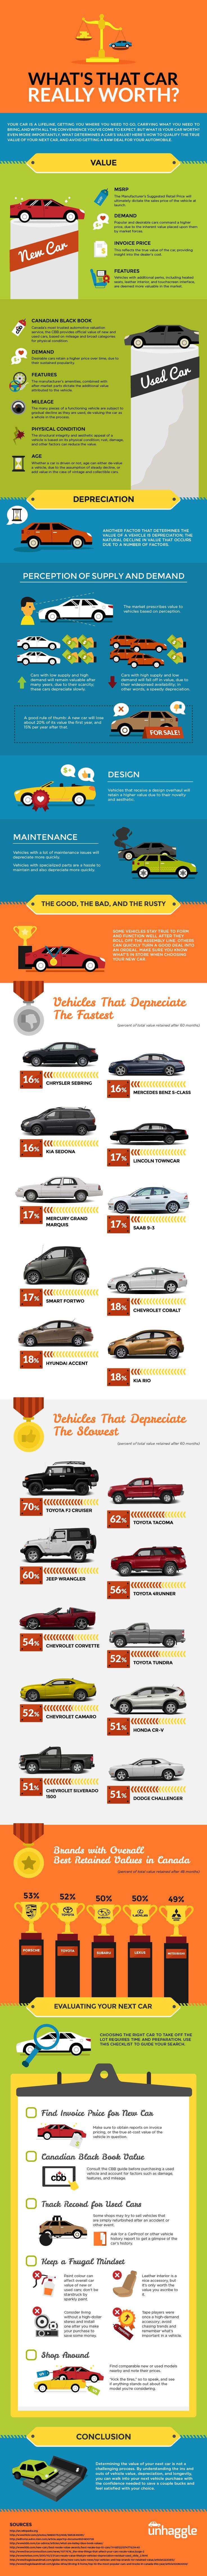 prices lottery cdl ferrari benz iaa mercedes marooned driving amg cars school sls